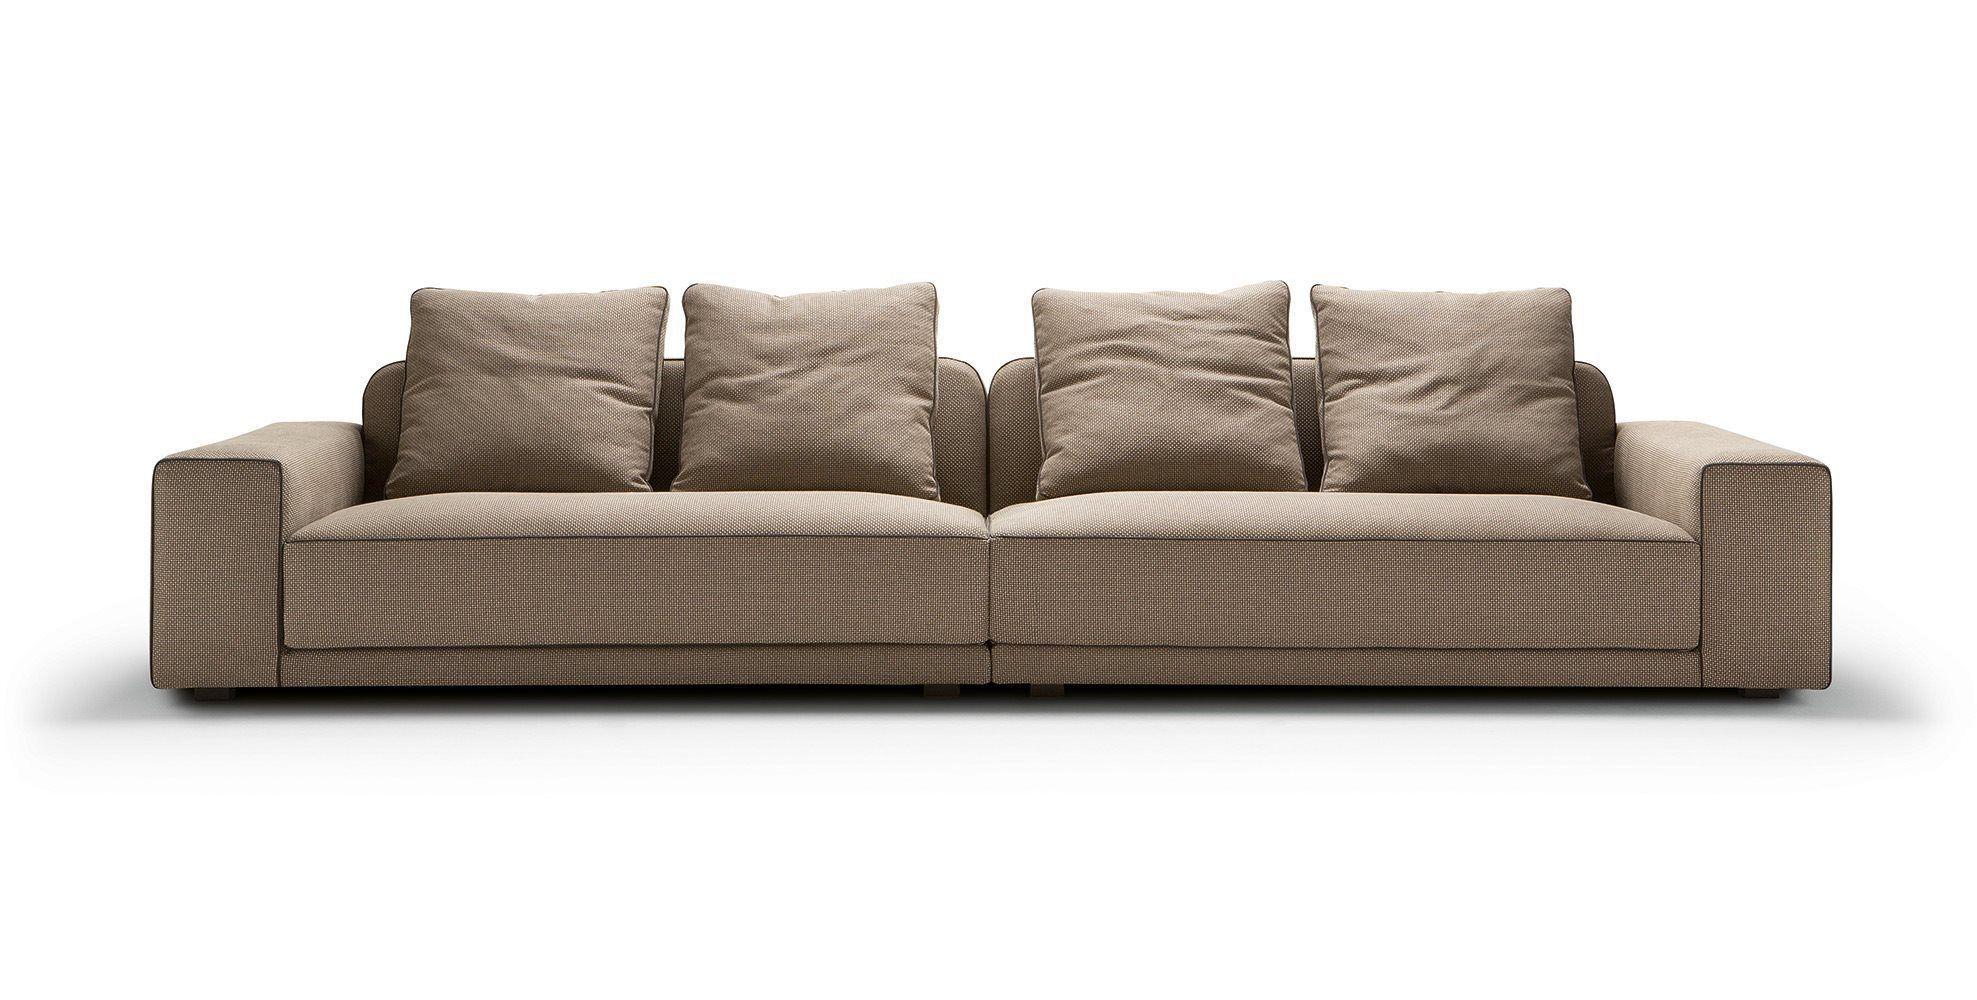 Modular sofa contemporary leather fabric TYRON by Castello